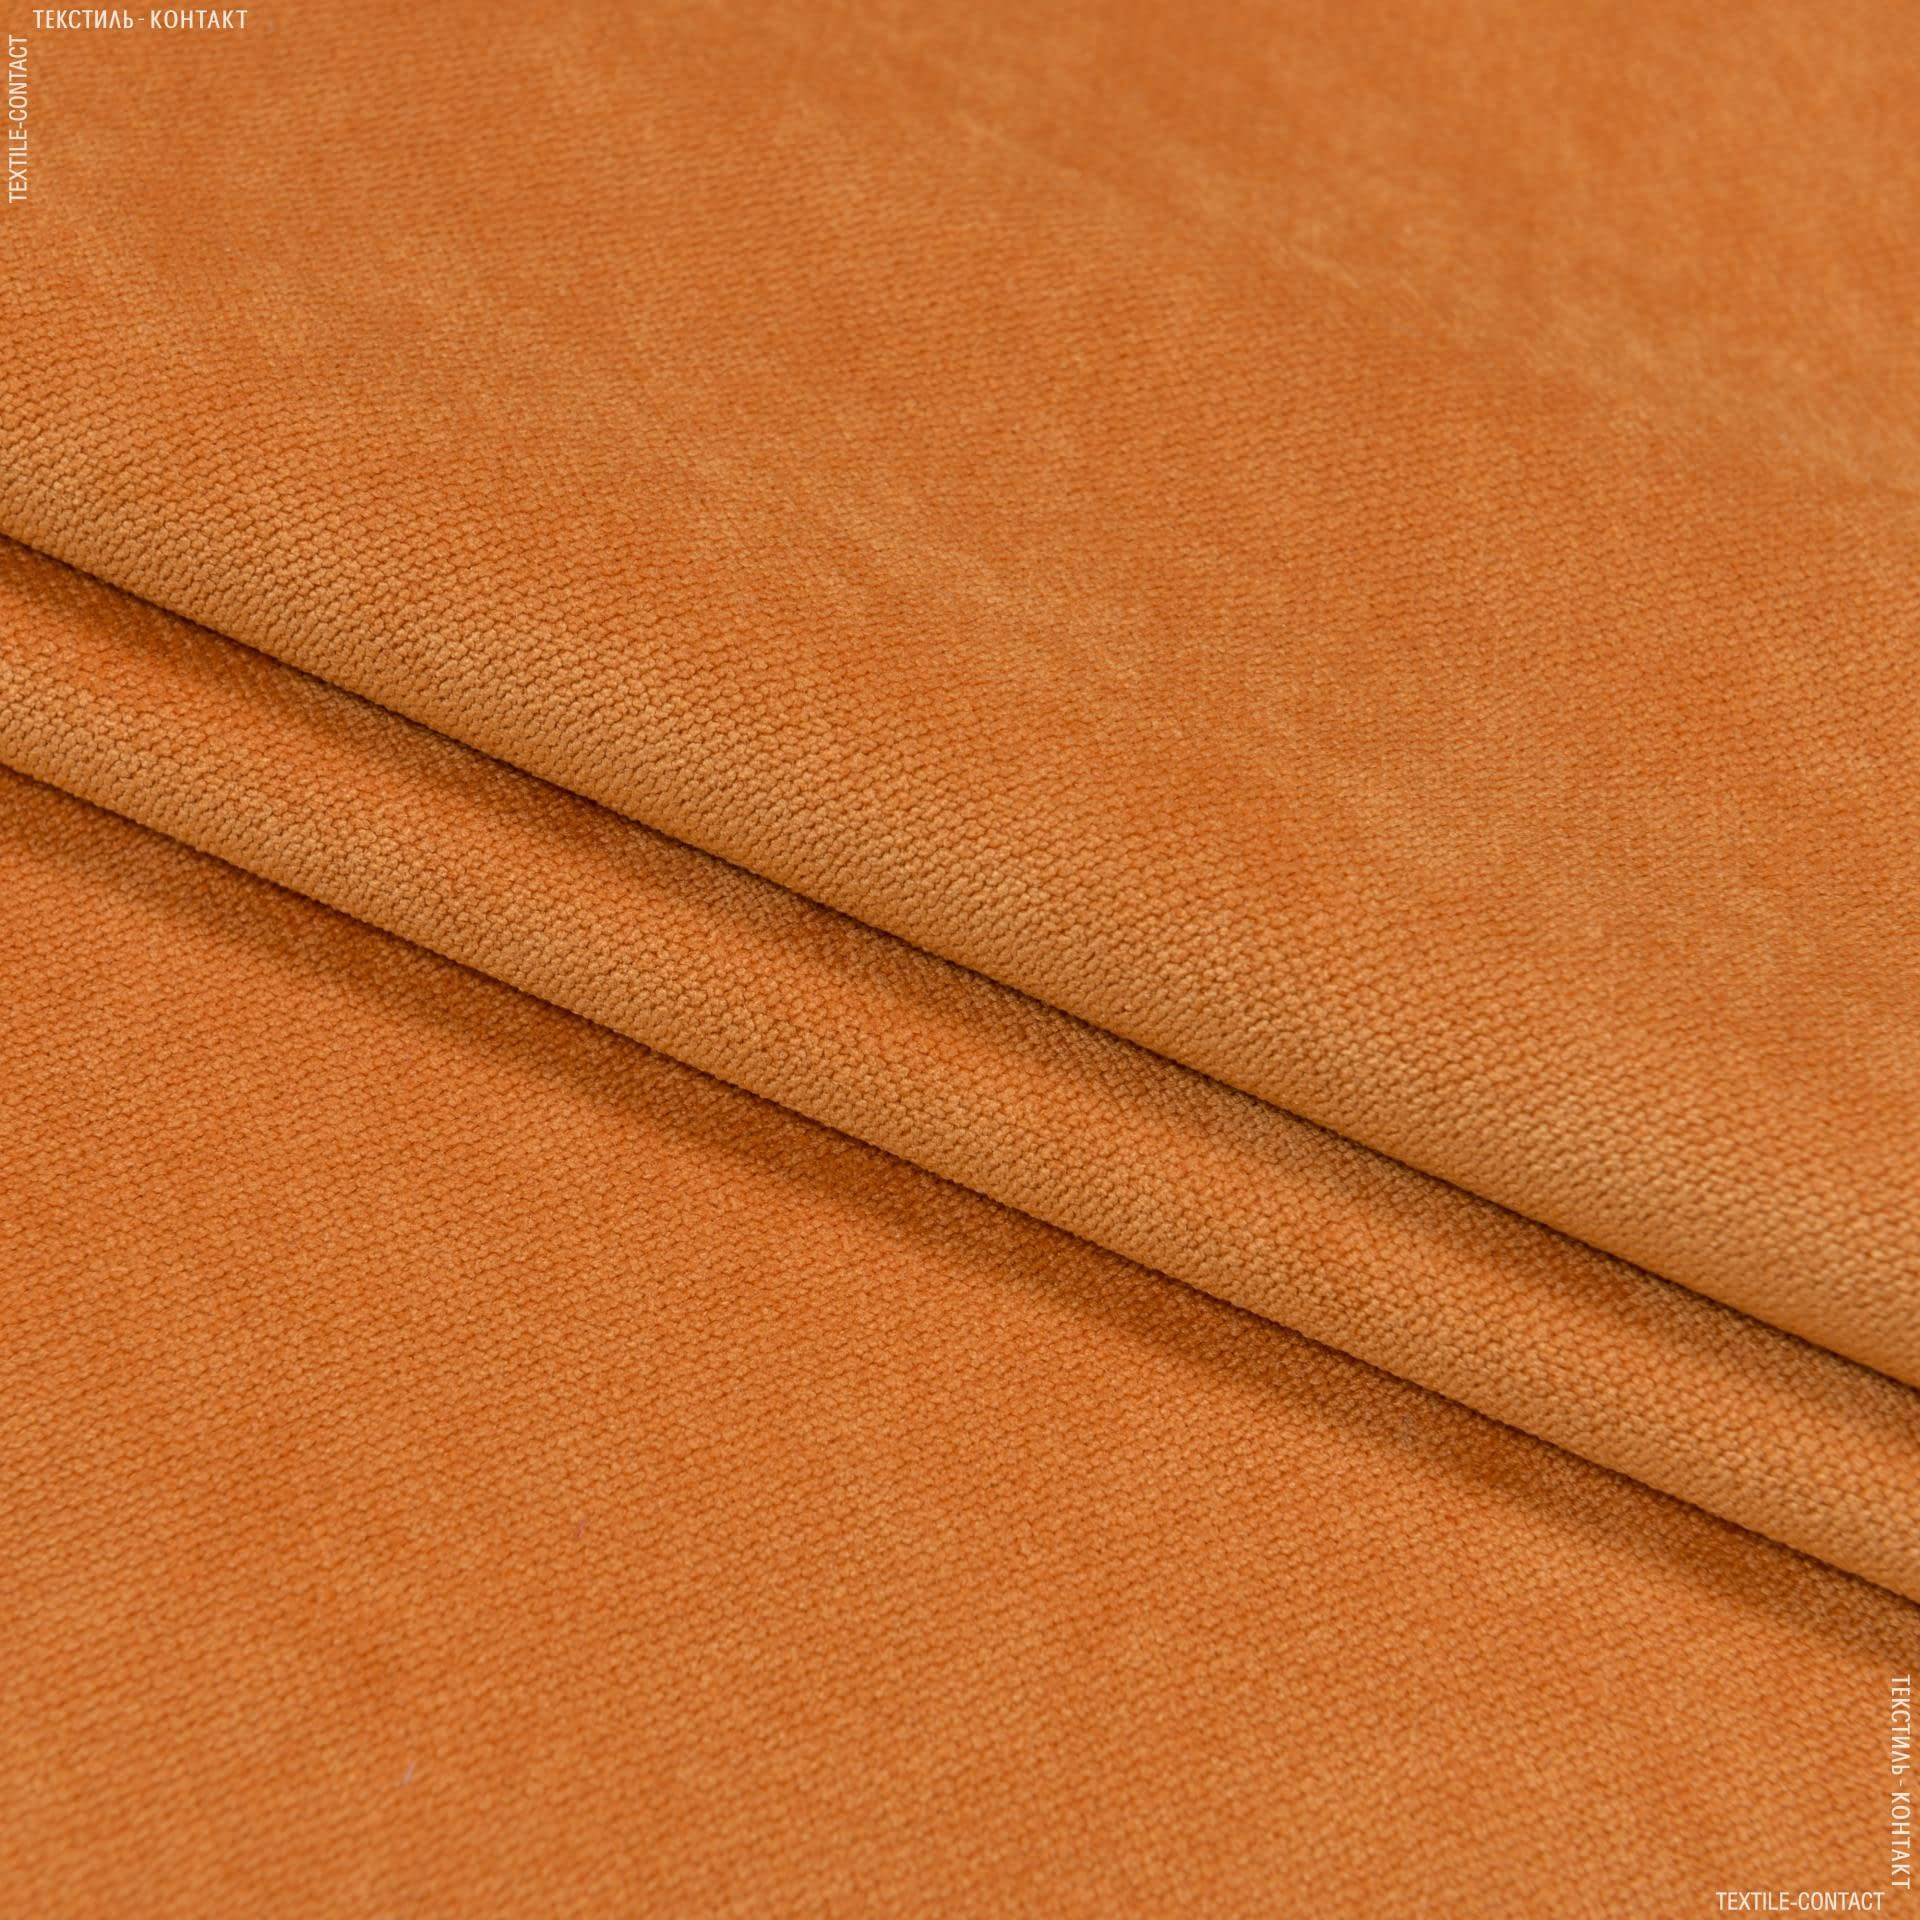 Ткани для мебели - Велюр будапешт/budapest оранжевый